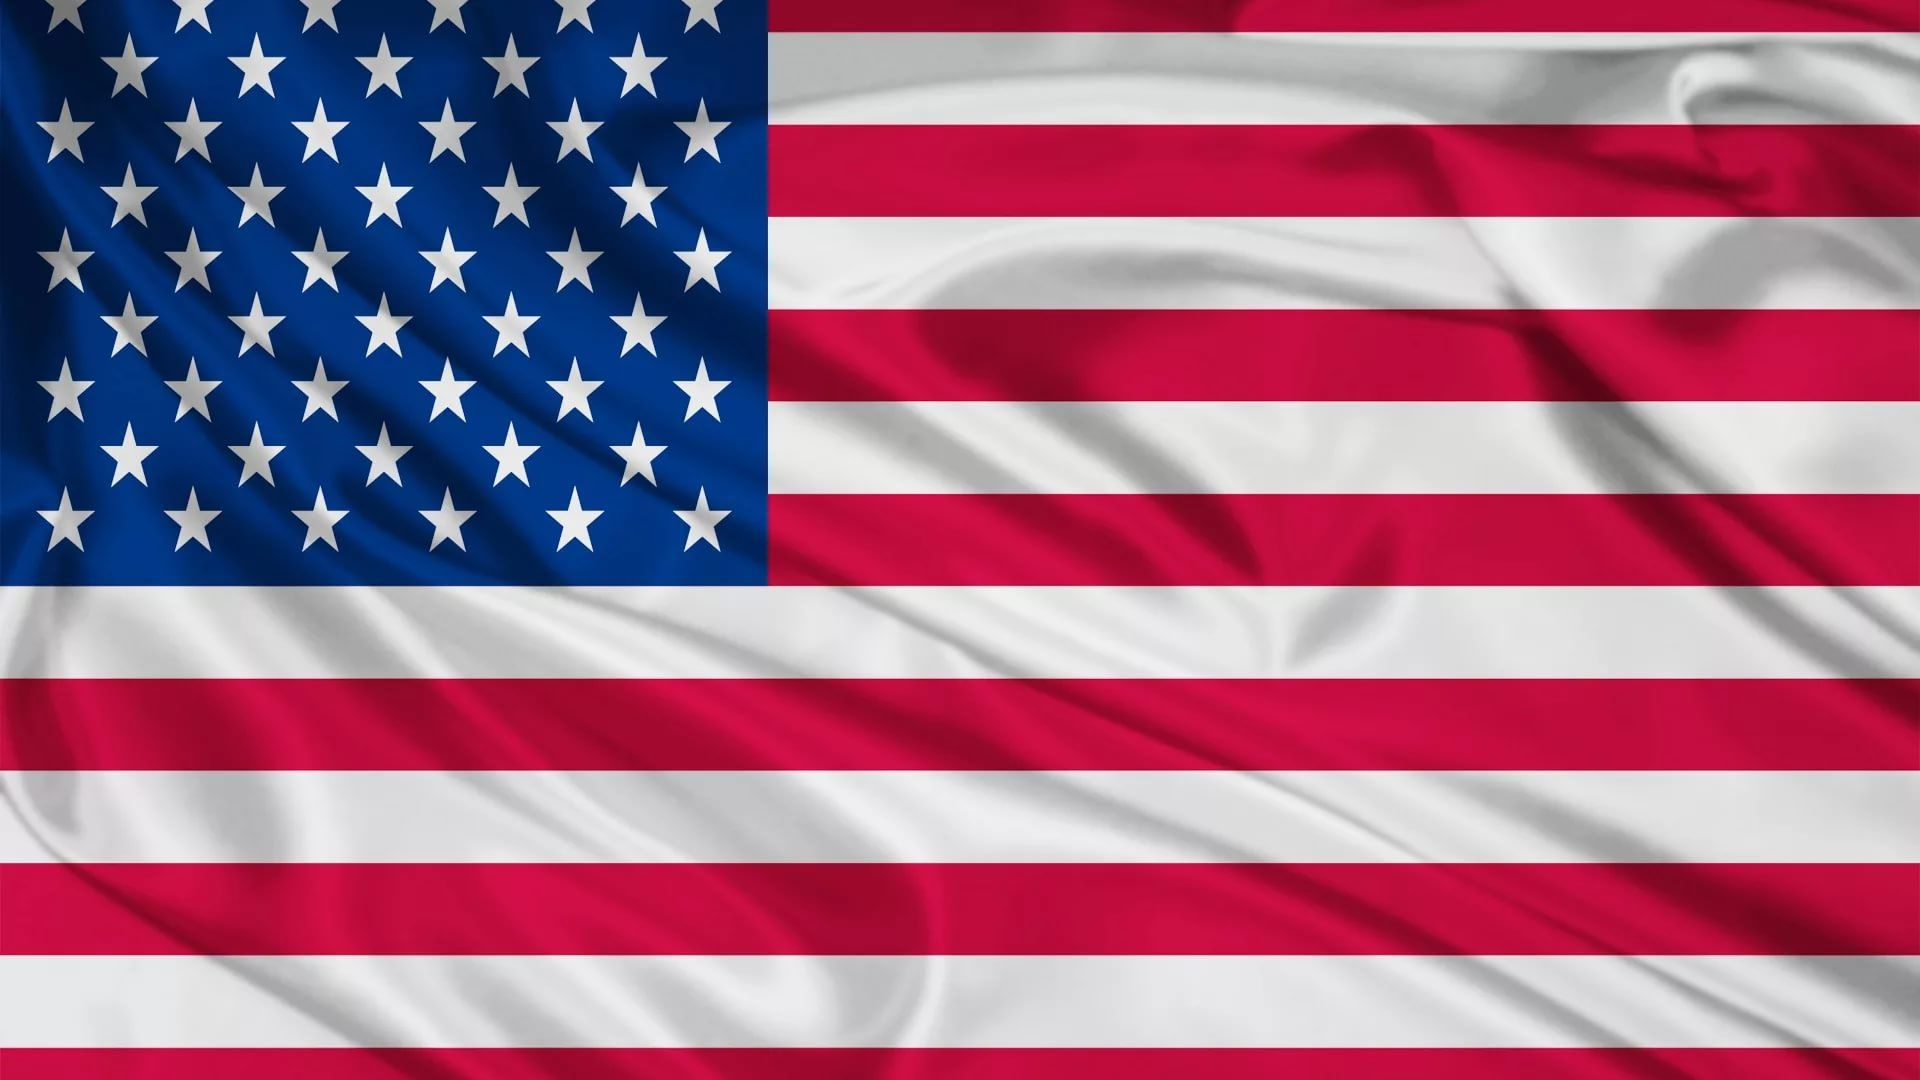 America Flag Cool HD Wallpaper